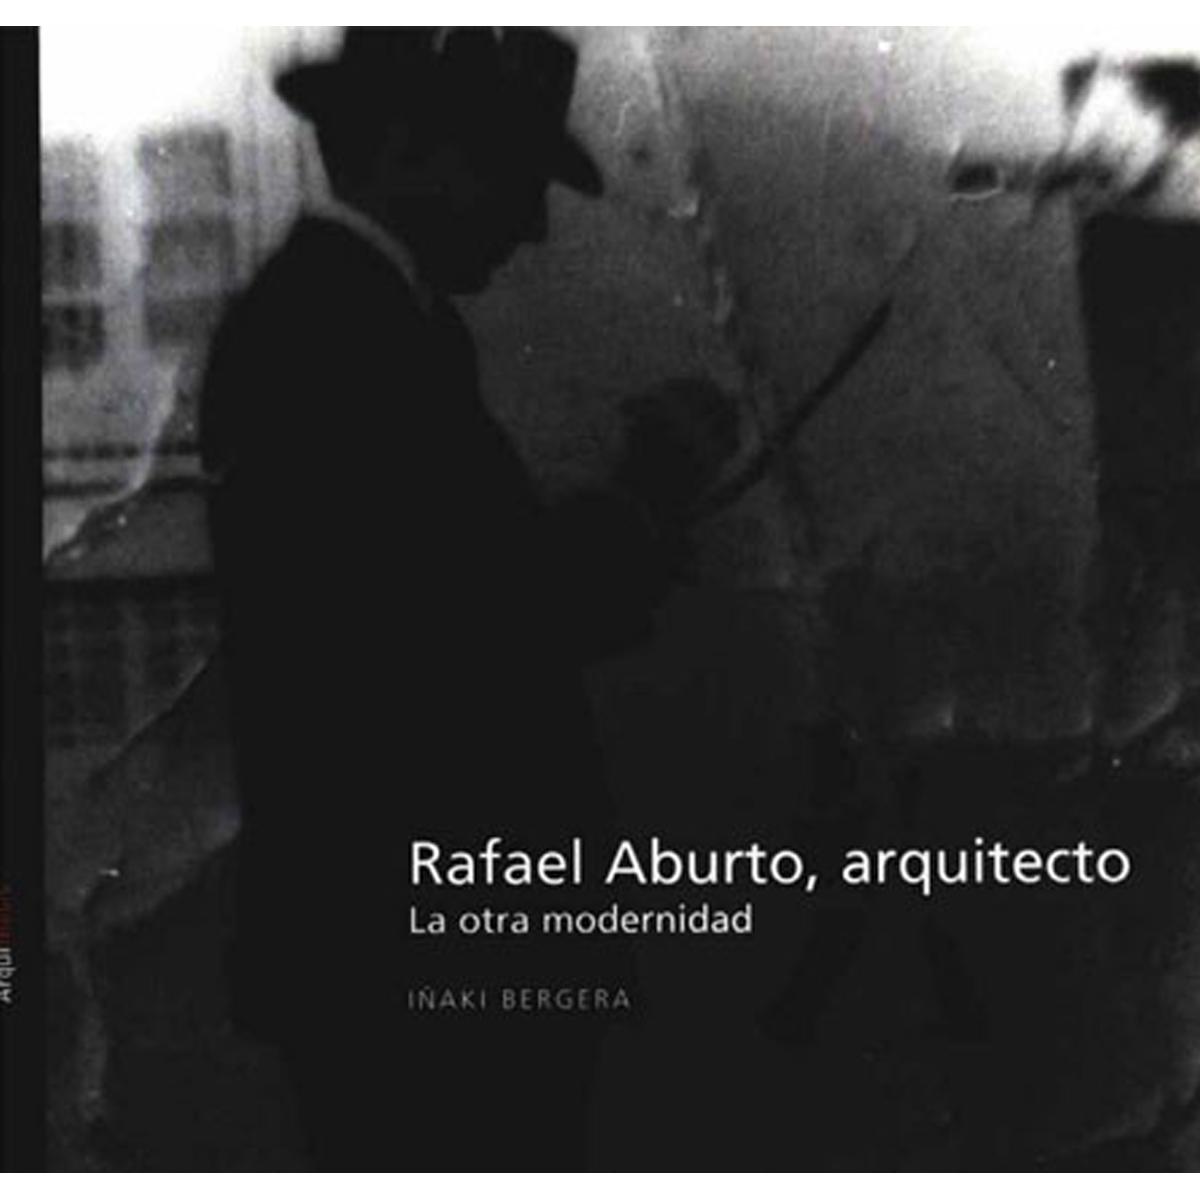 Rafael Aburto, arquitecto